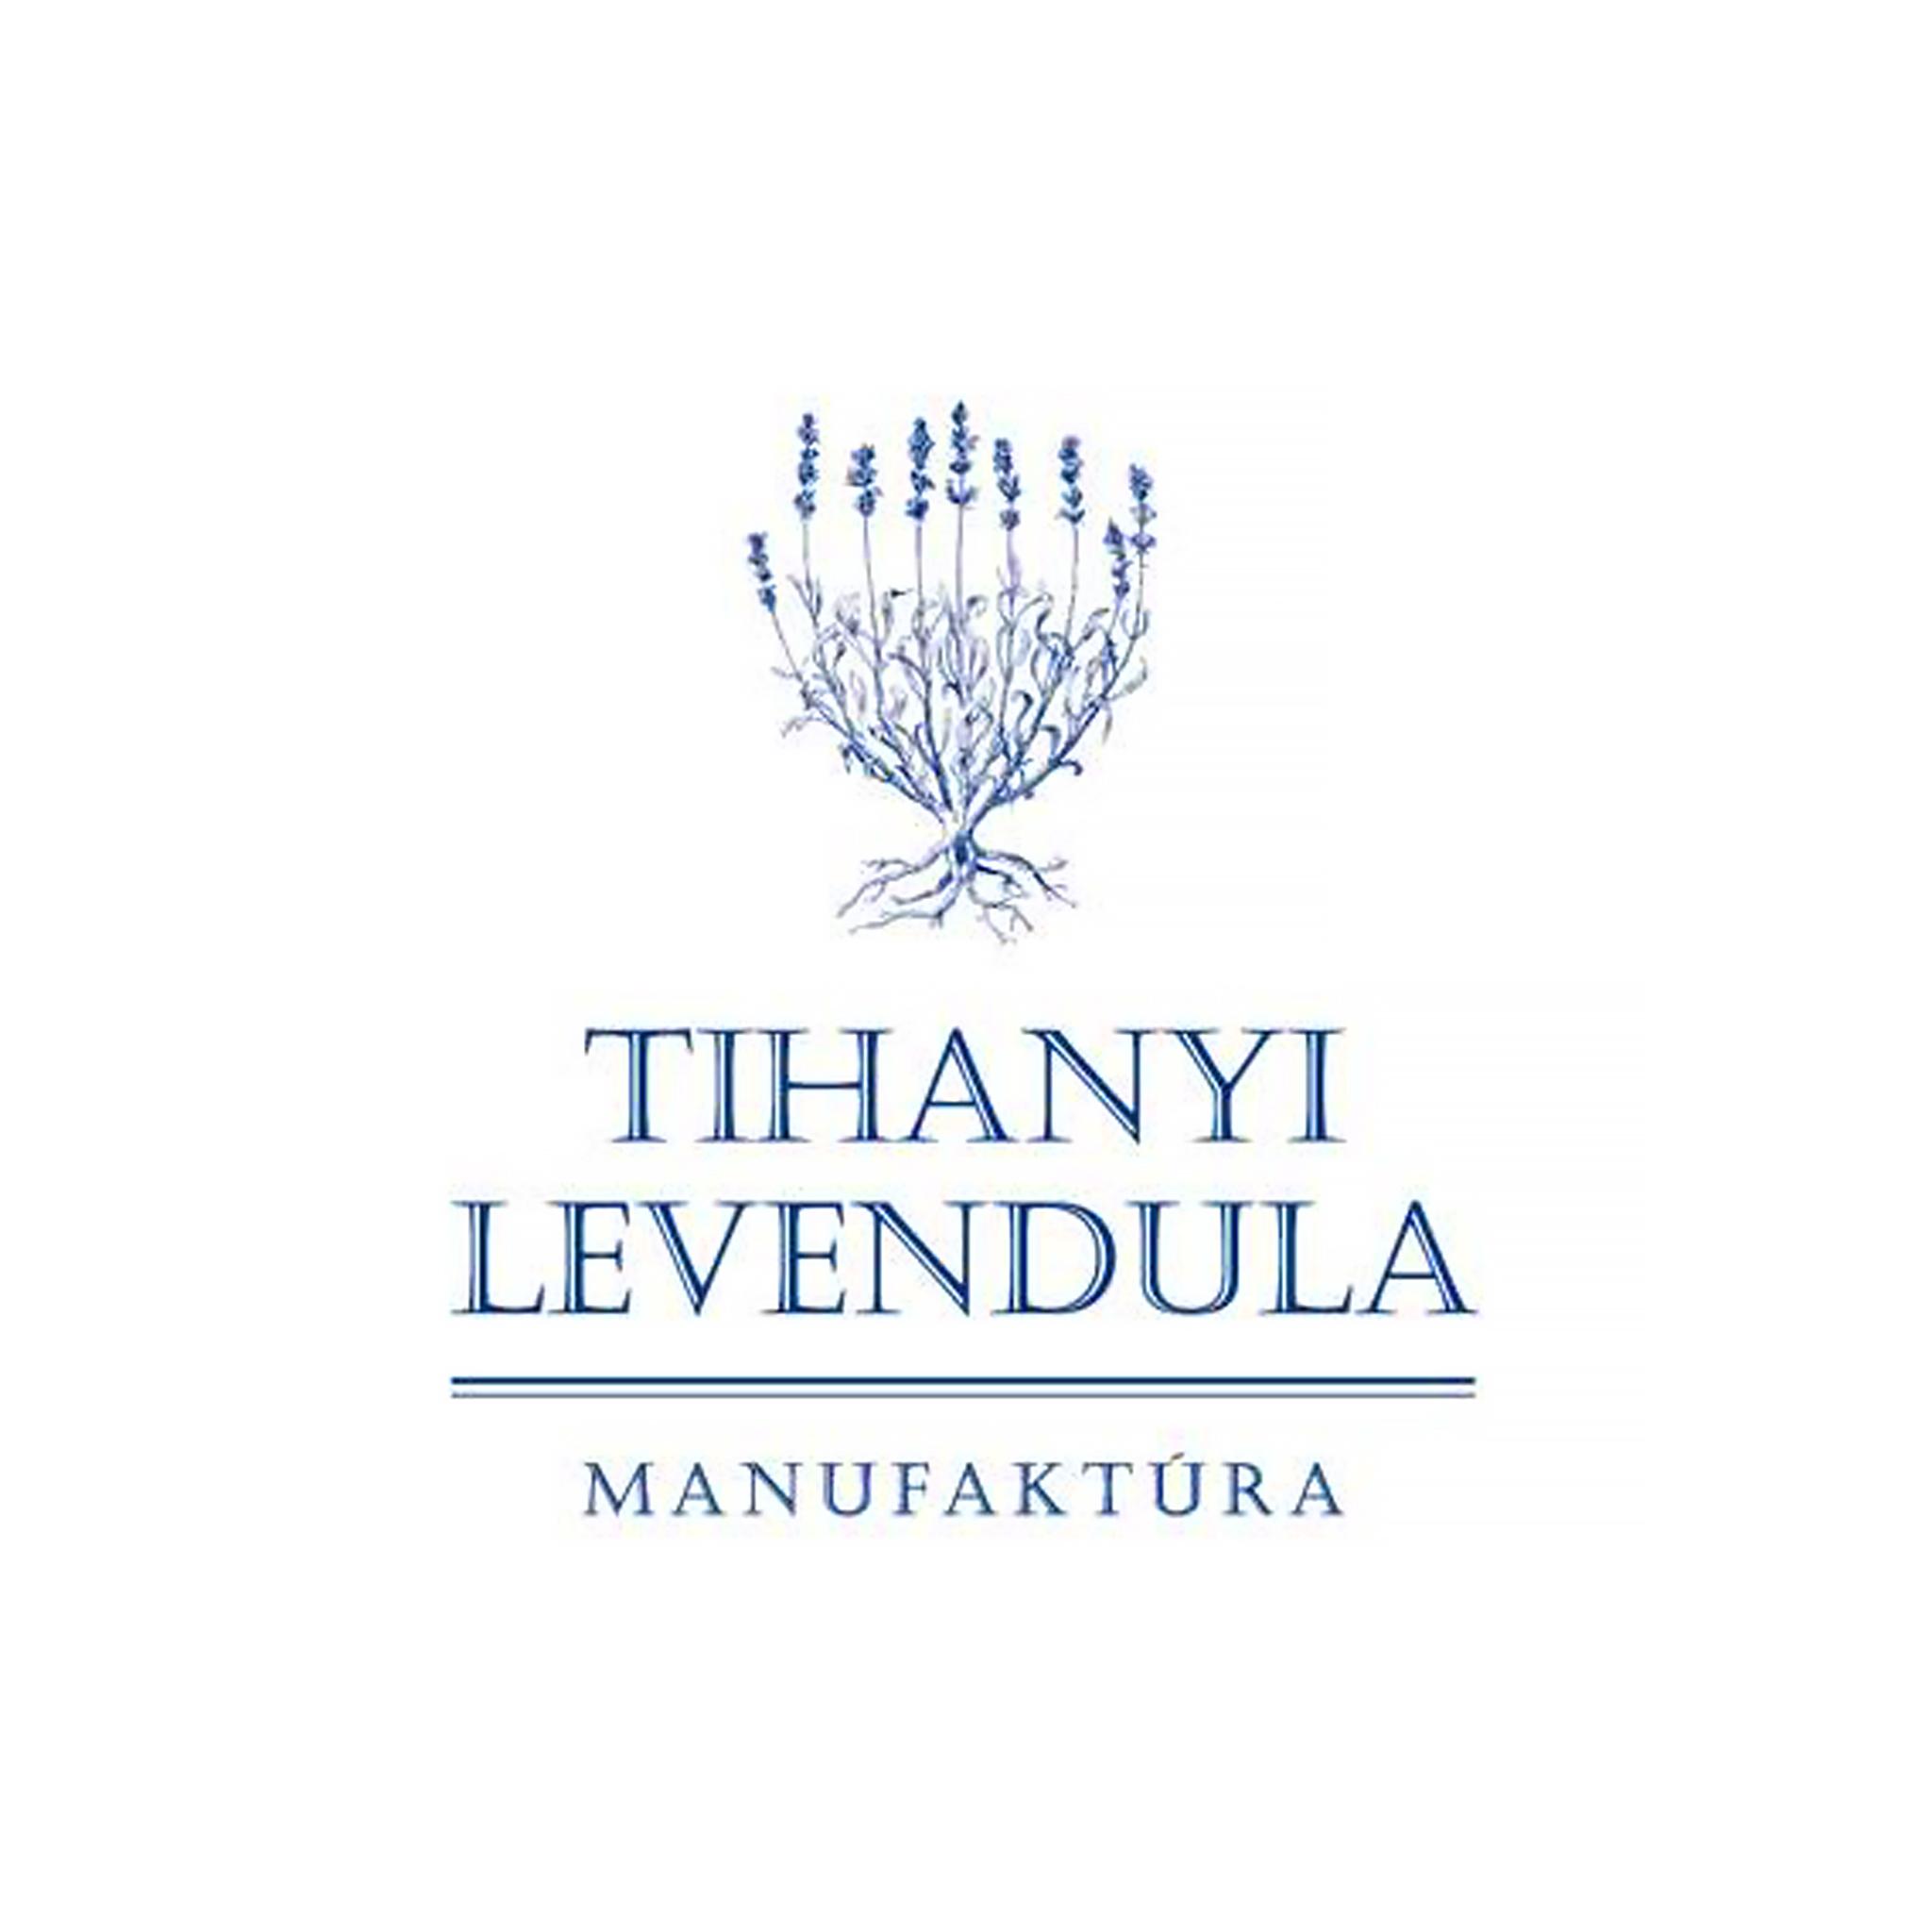 Tihanyi Levendula Manufaktúra